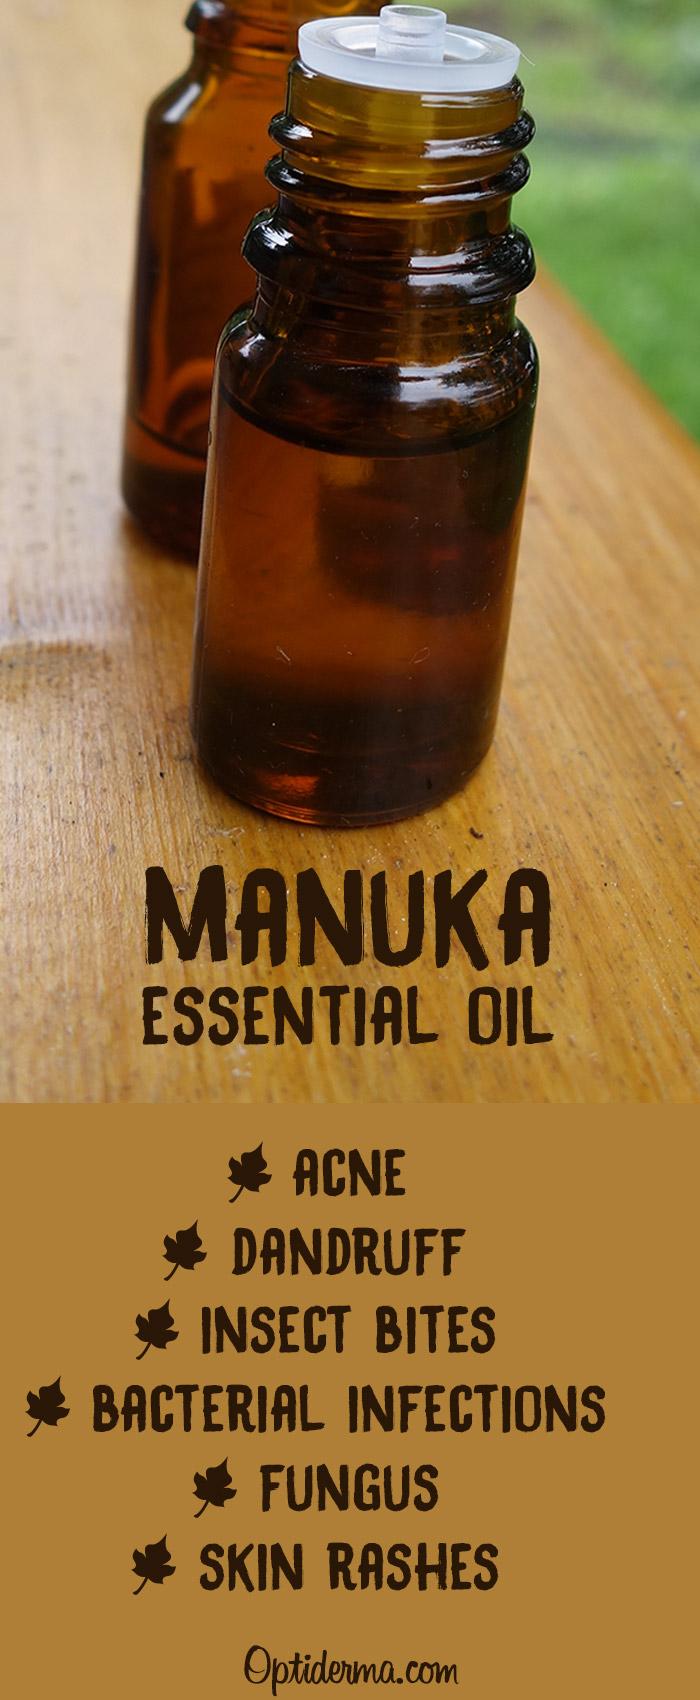 Health Benefits of Manuka Oil